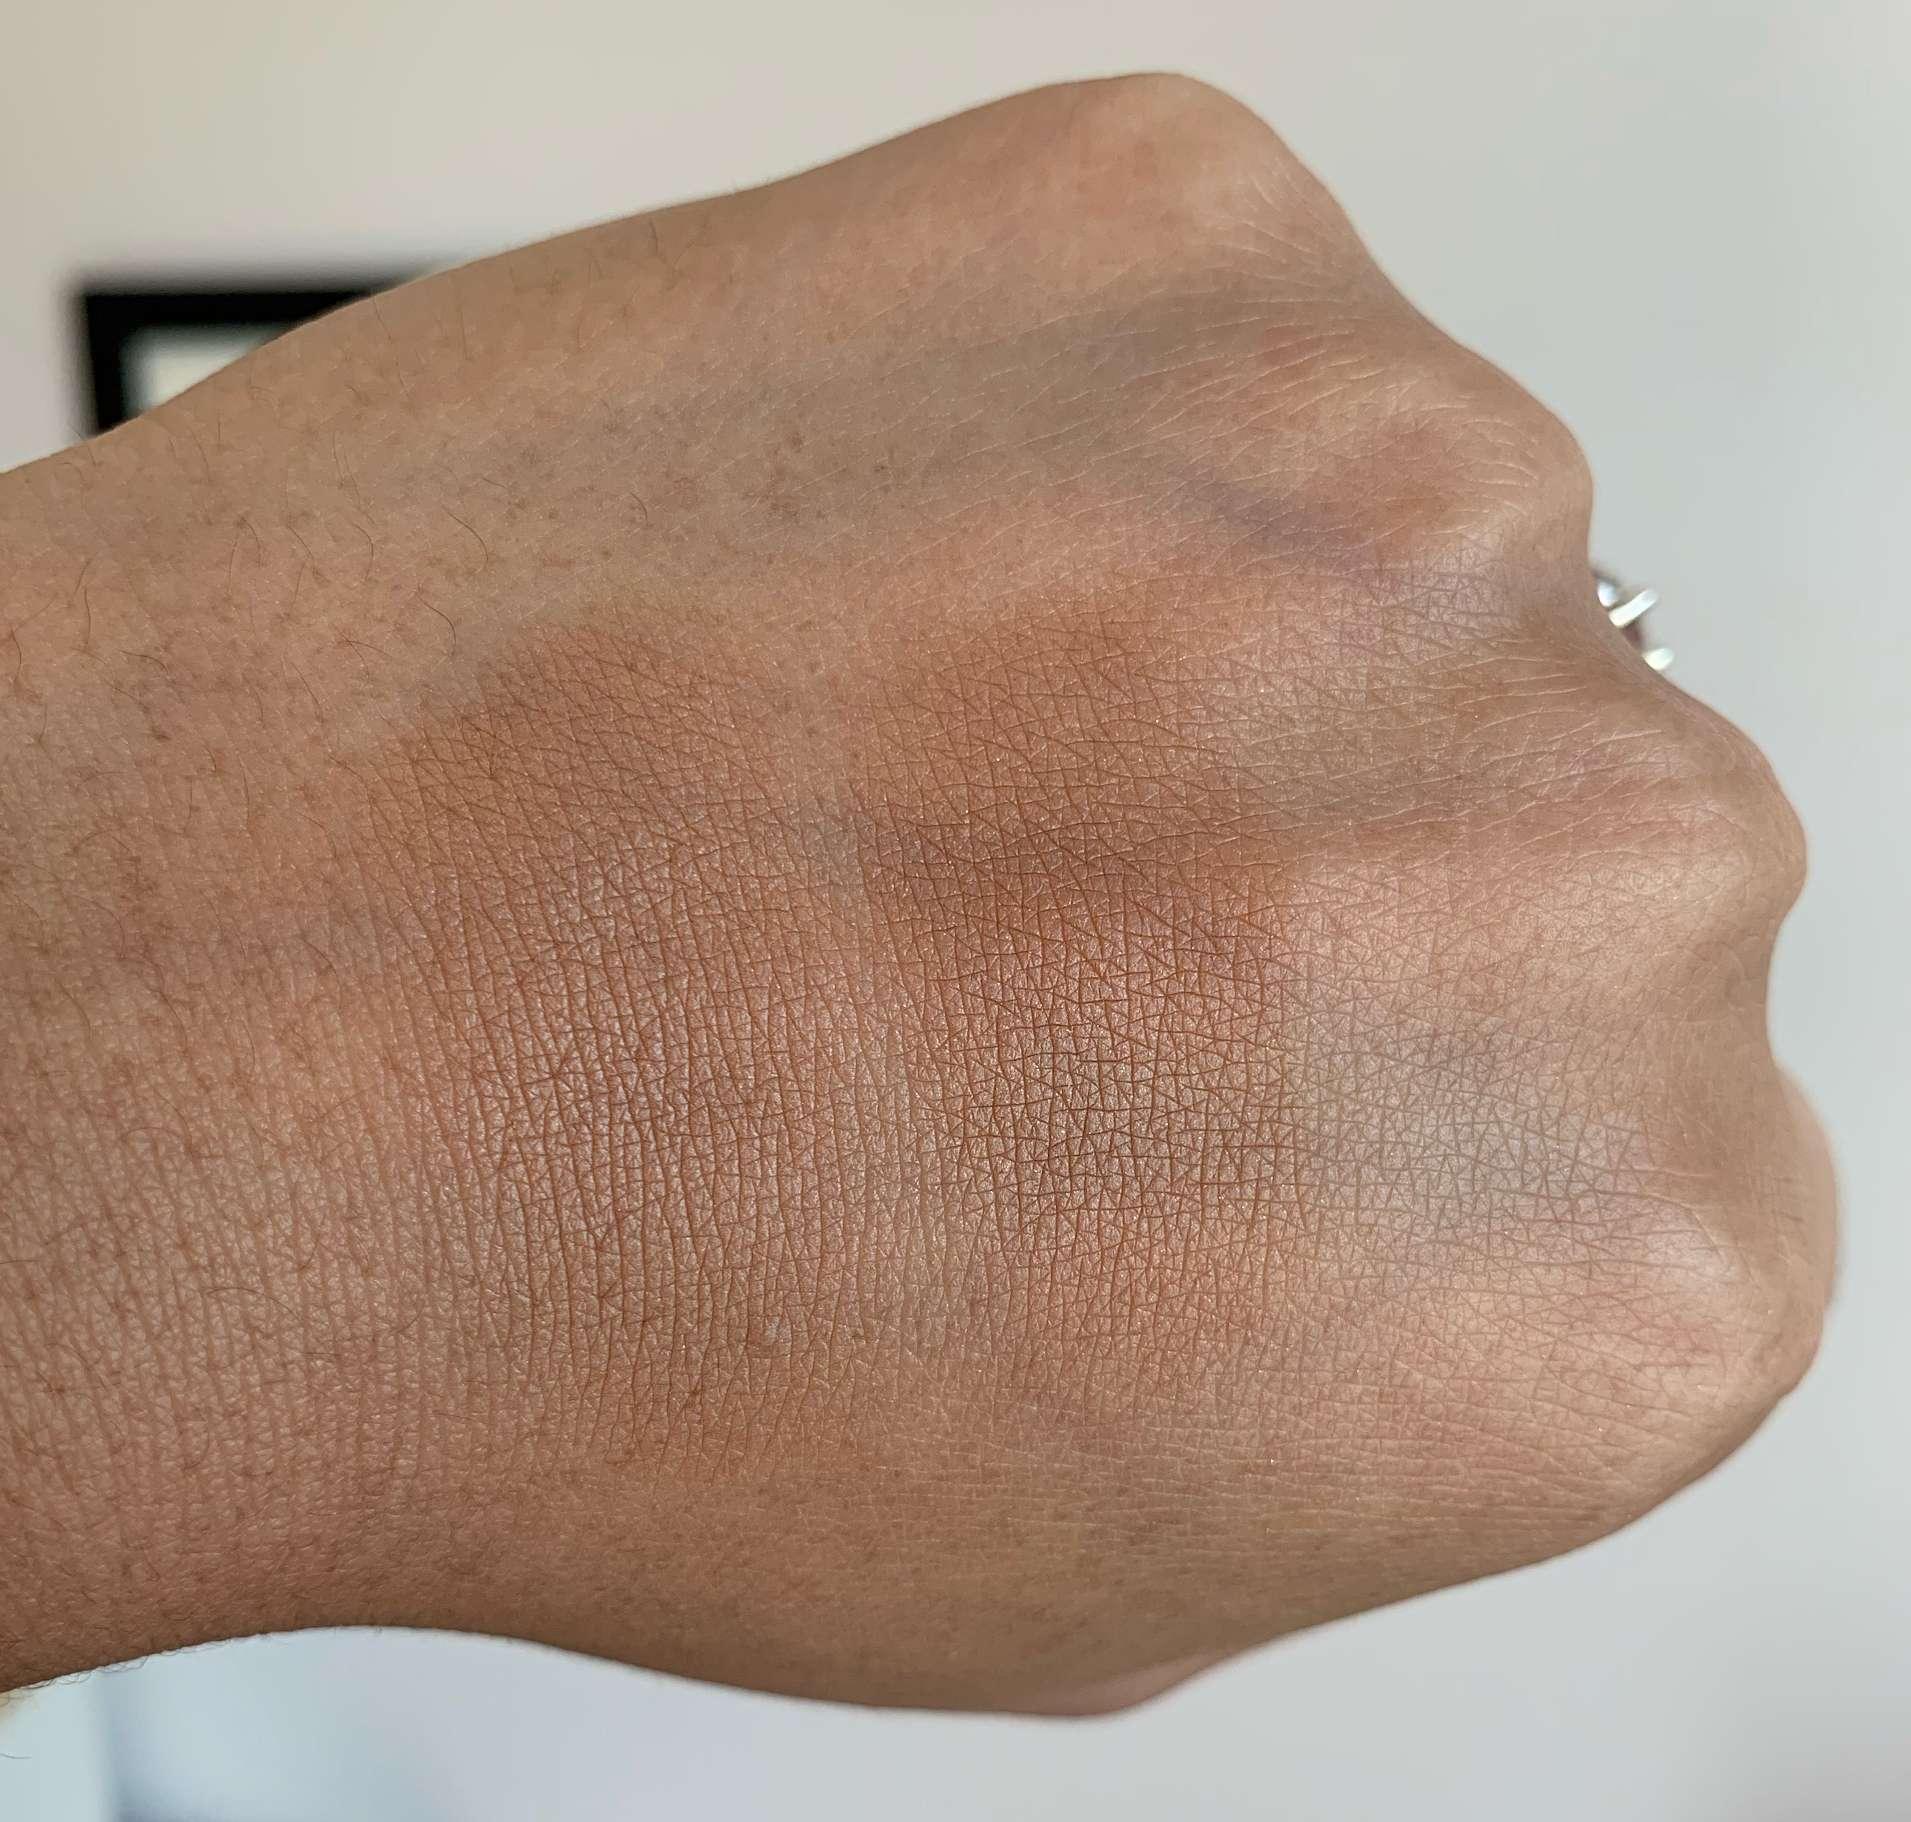 MAC Sun Soaked Strip Bronzer and Becca Ipanema Sun Bronzer Swatches on Medium Dark Skin